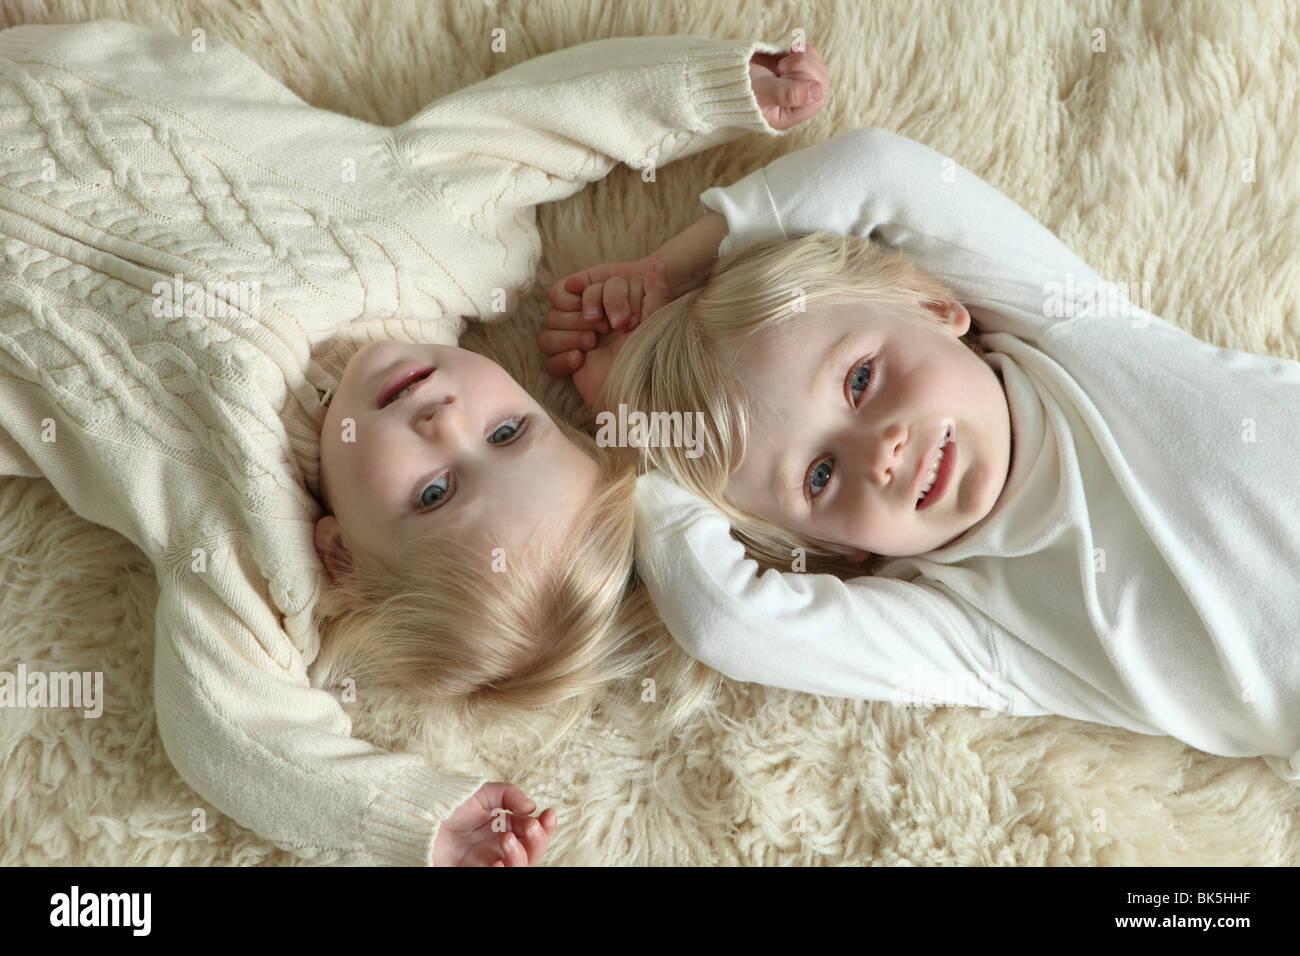 Brother and sister laying on sheepskin rug - Stock Image